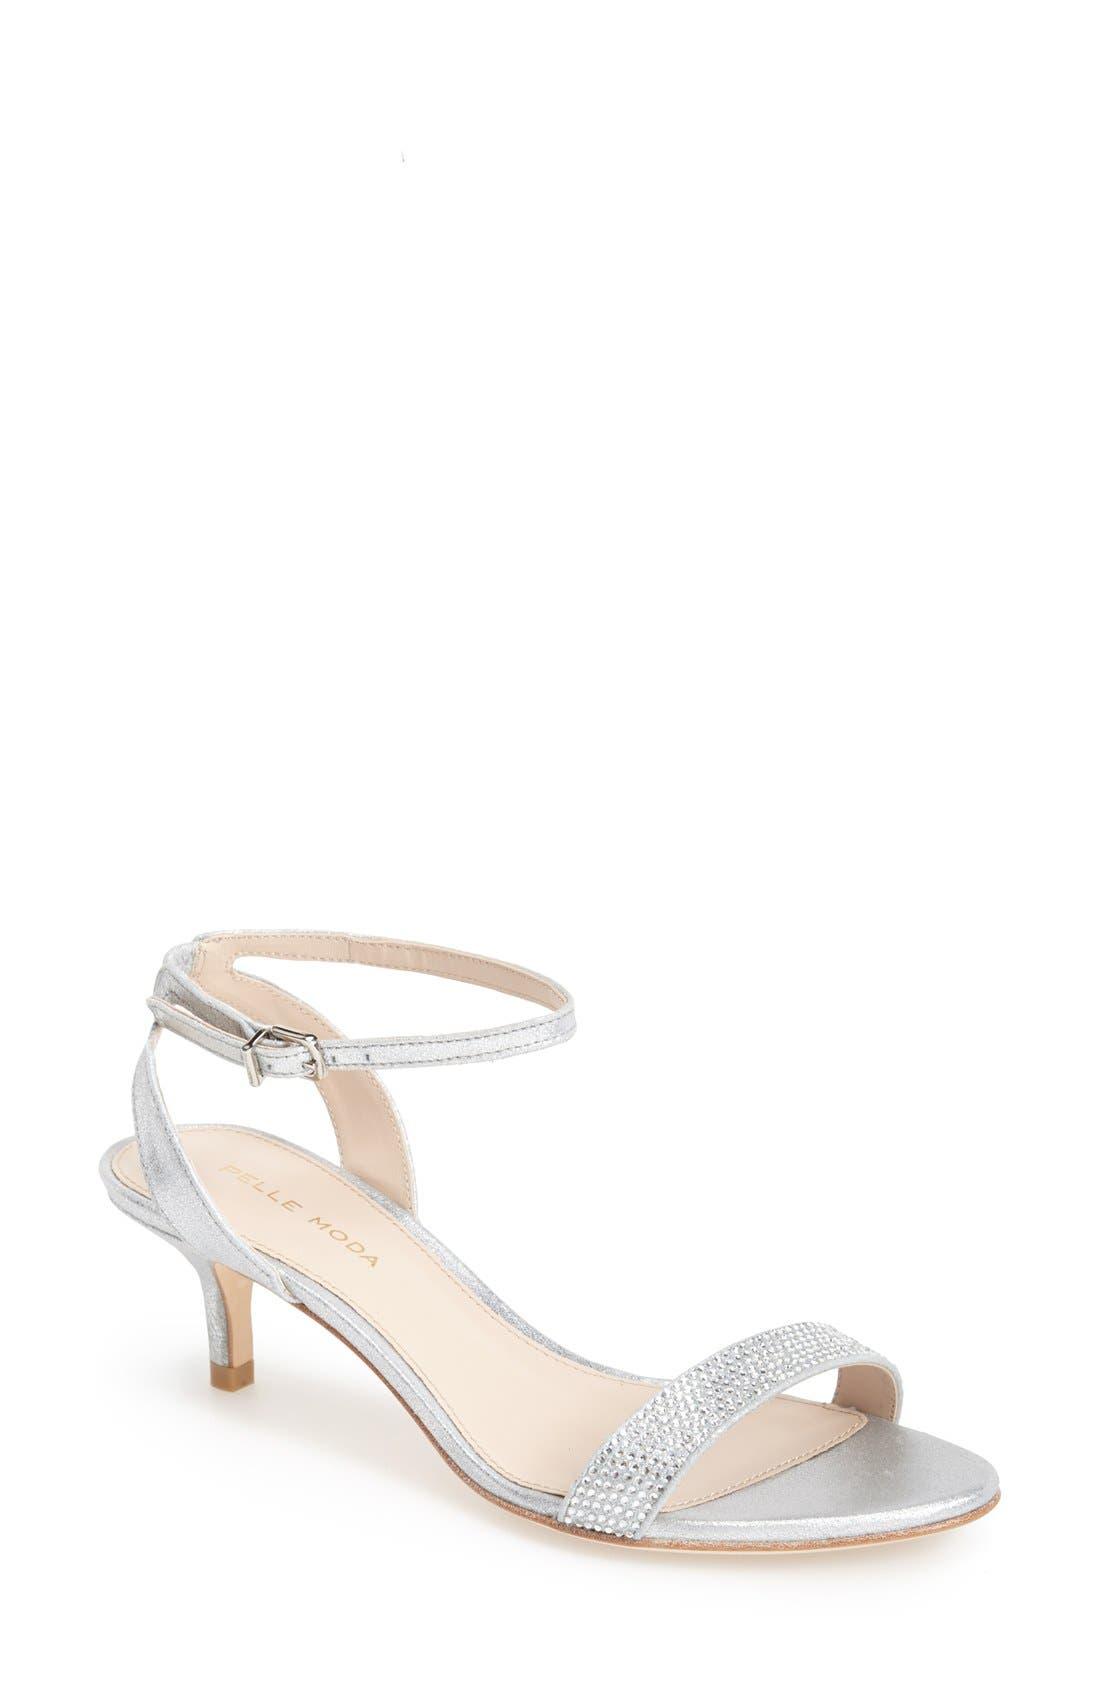 PELLE MODA 'Fabia' Sandal, Main, color, SILVER